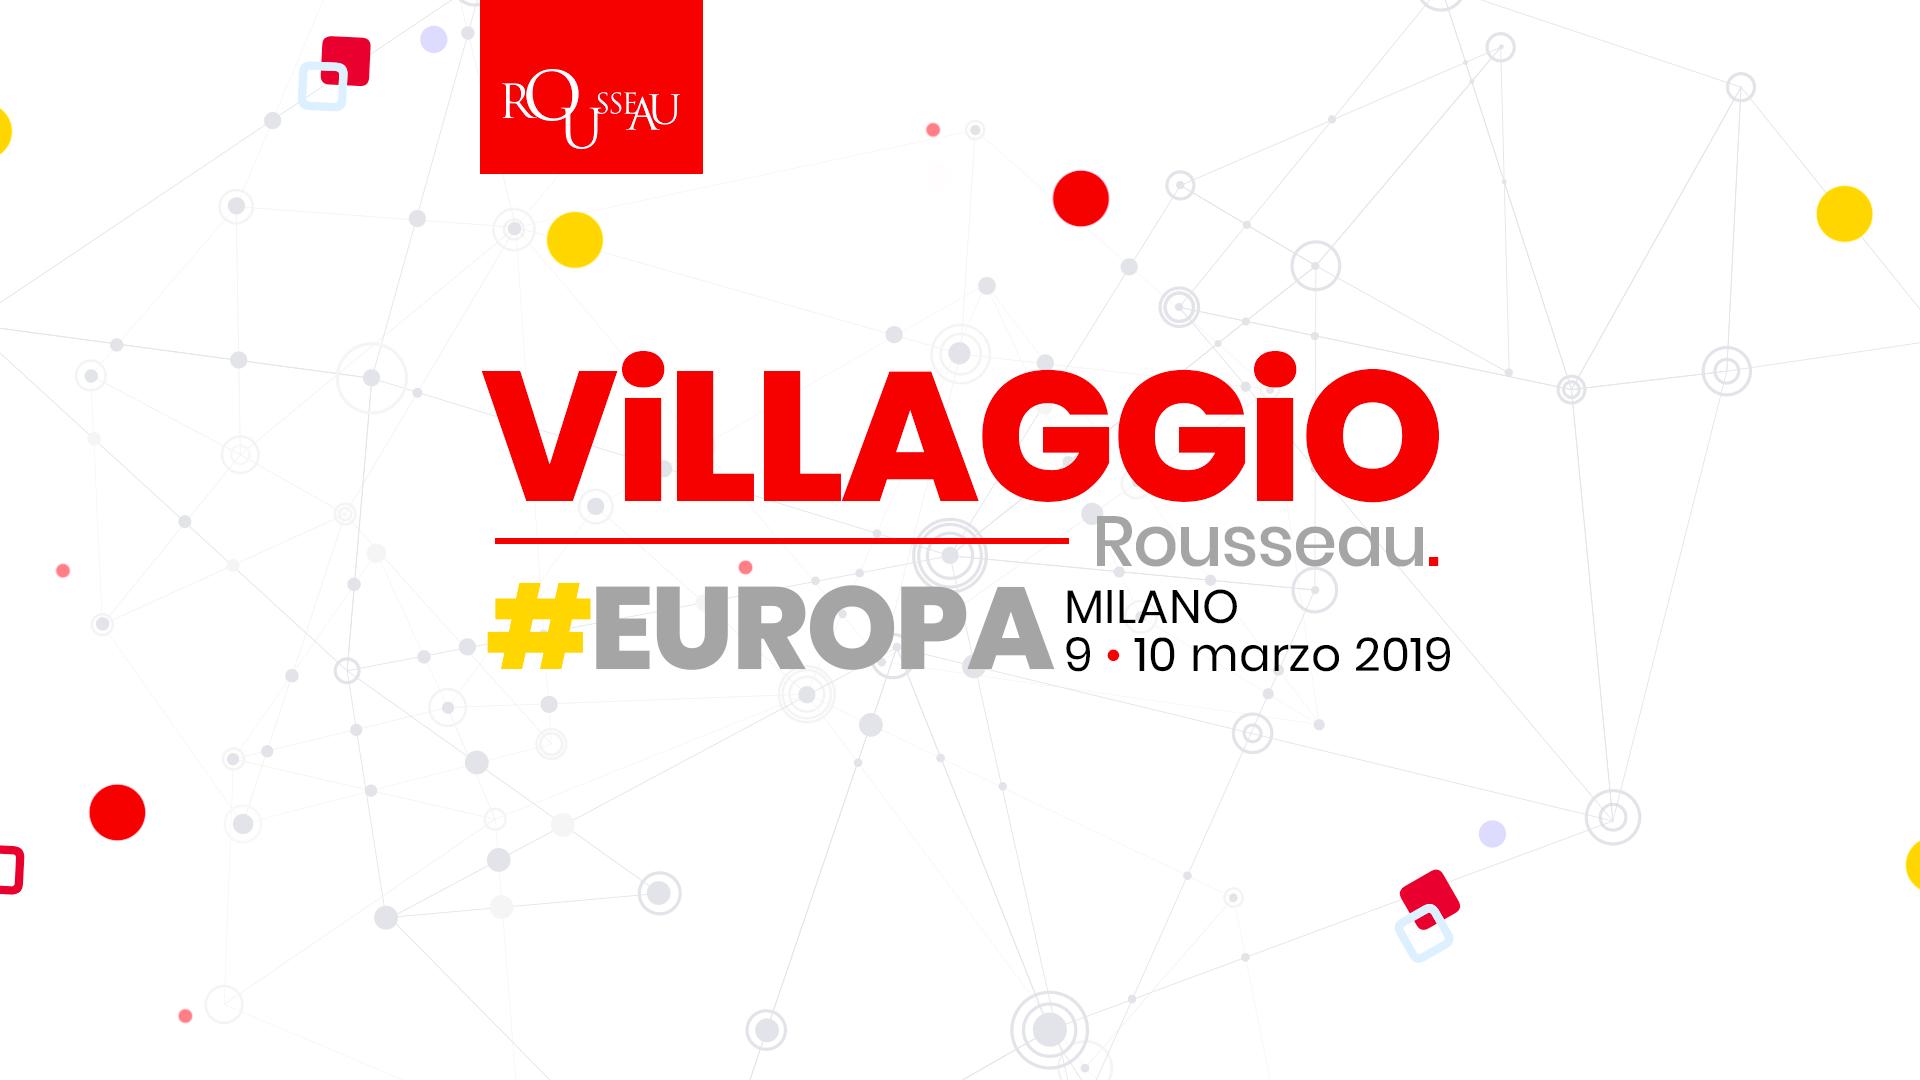 Villaggio Rousseau Europa